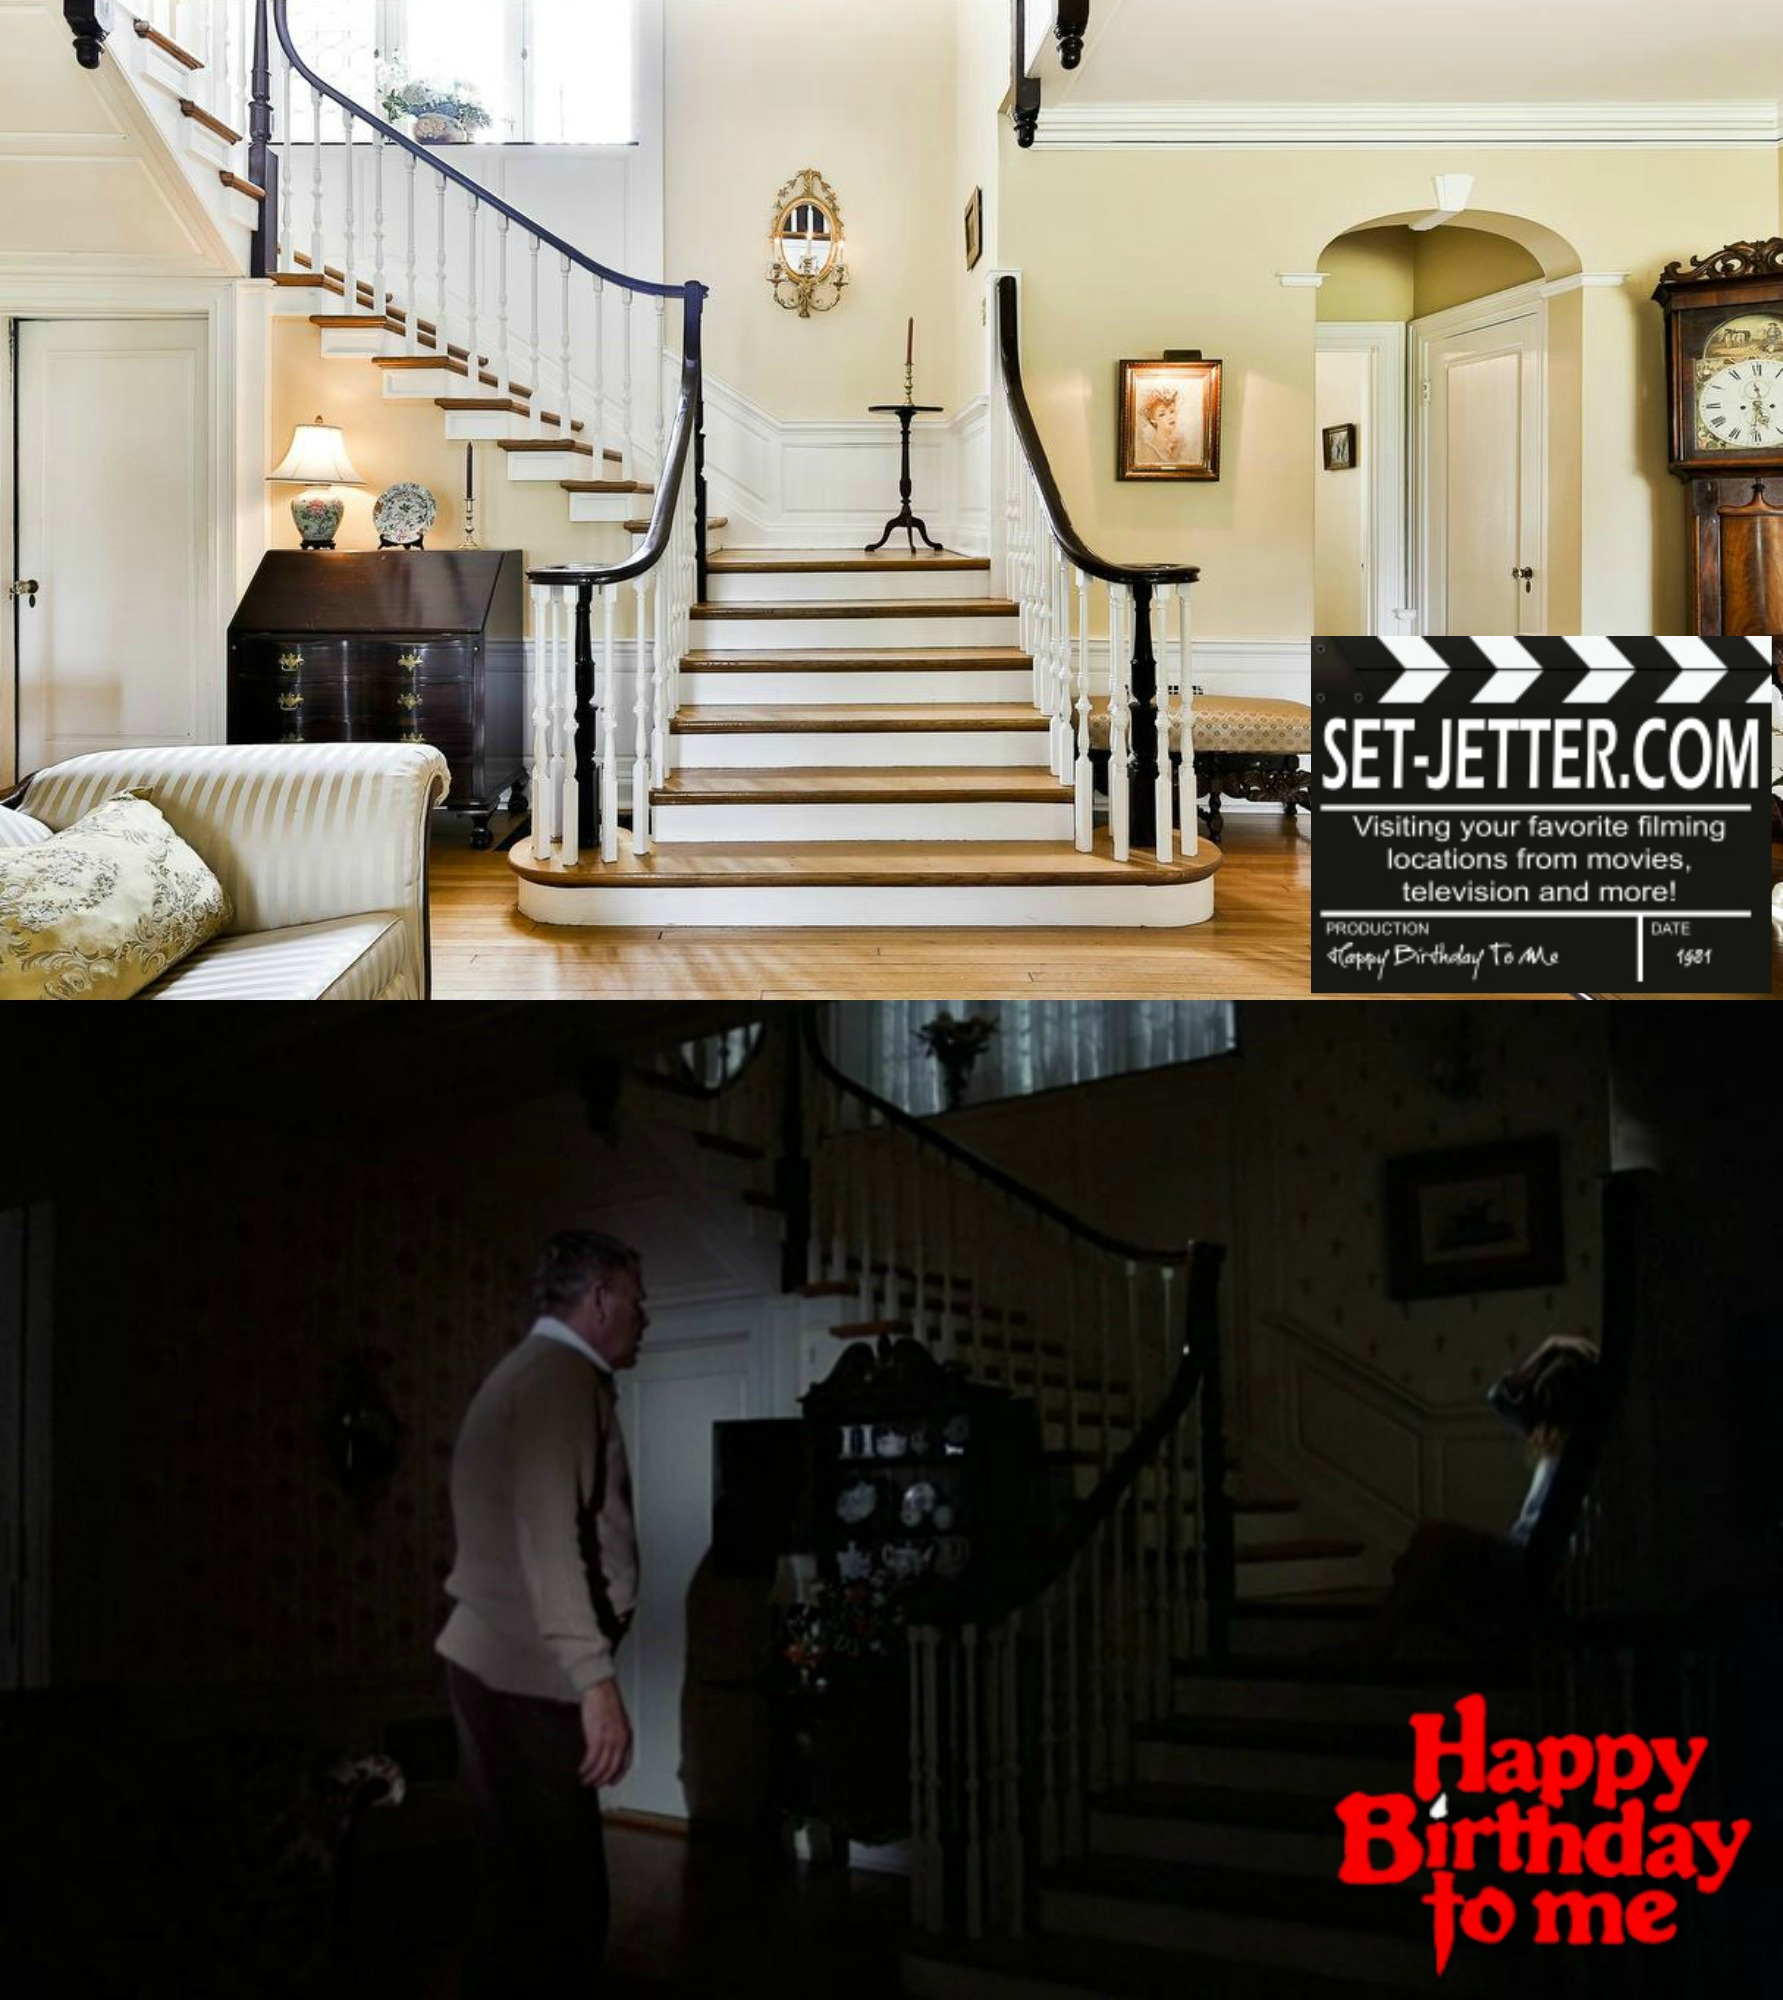 Happy Birthday To Me comparison 118.jpg